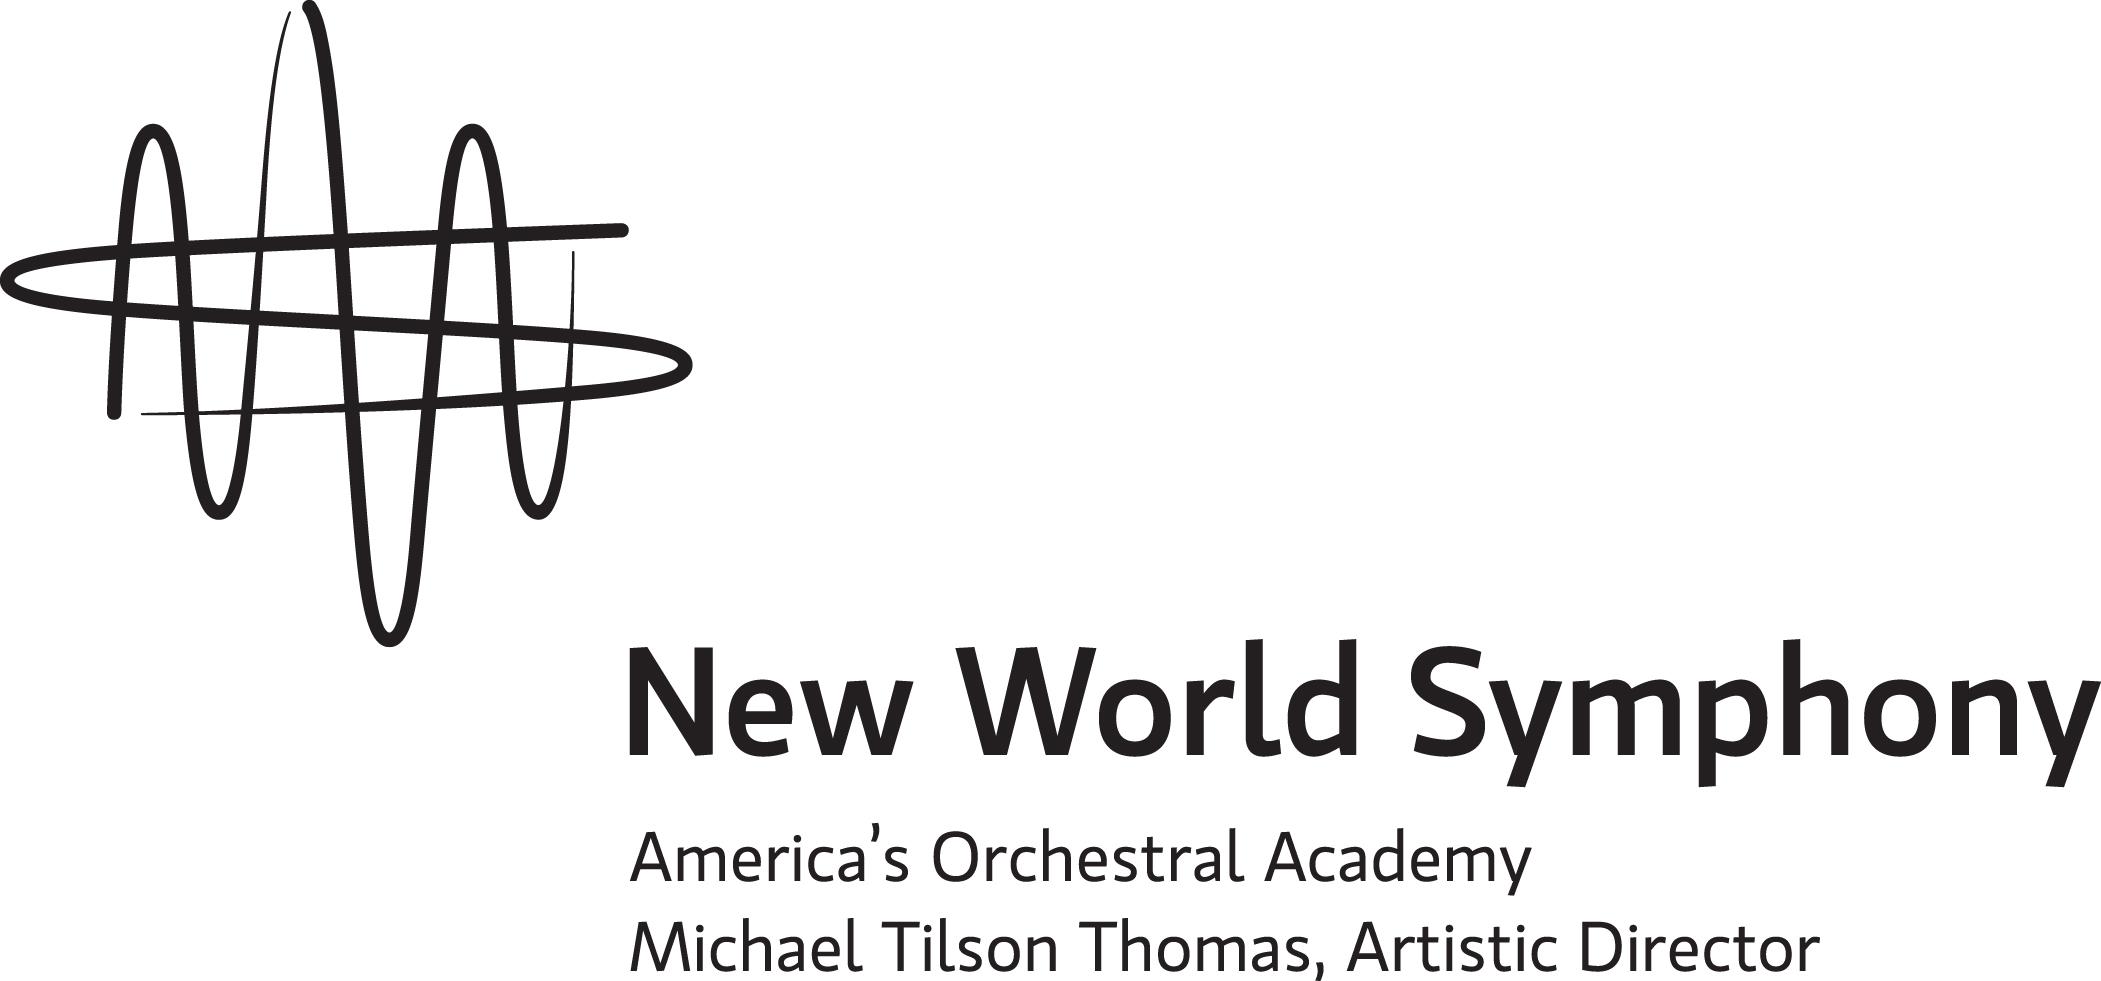 NWS_logo